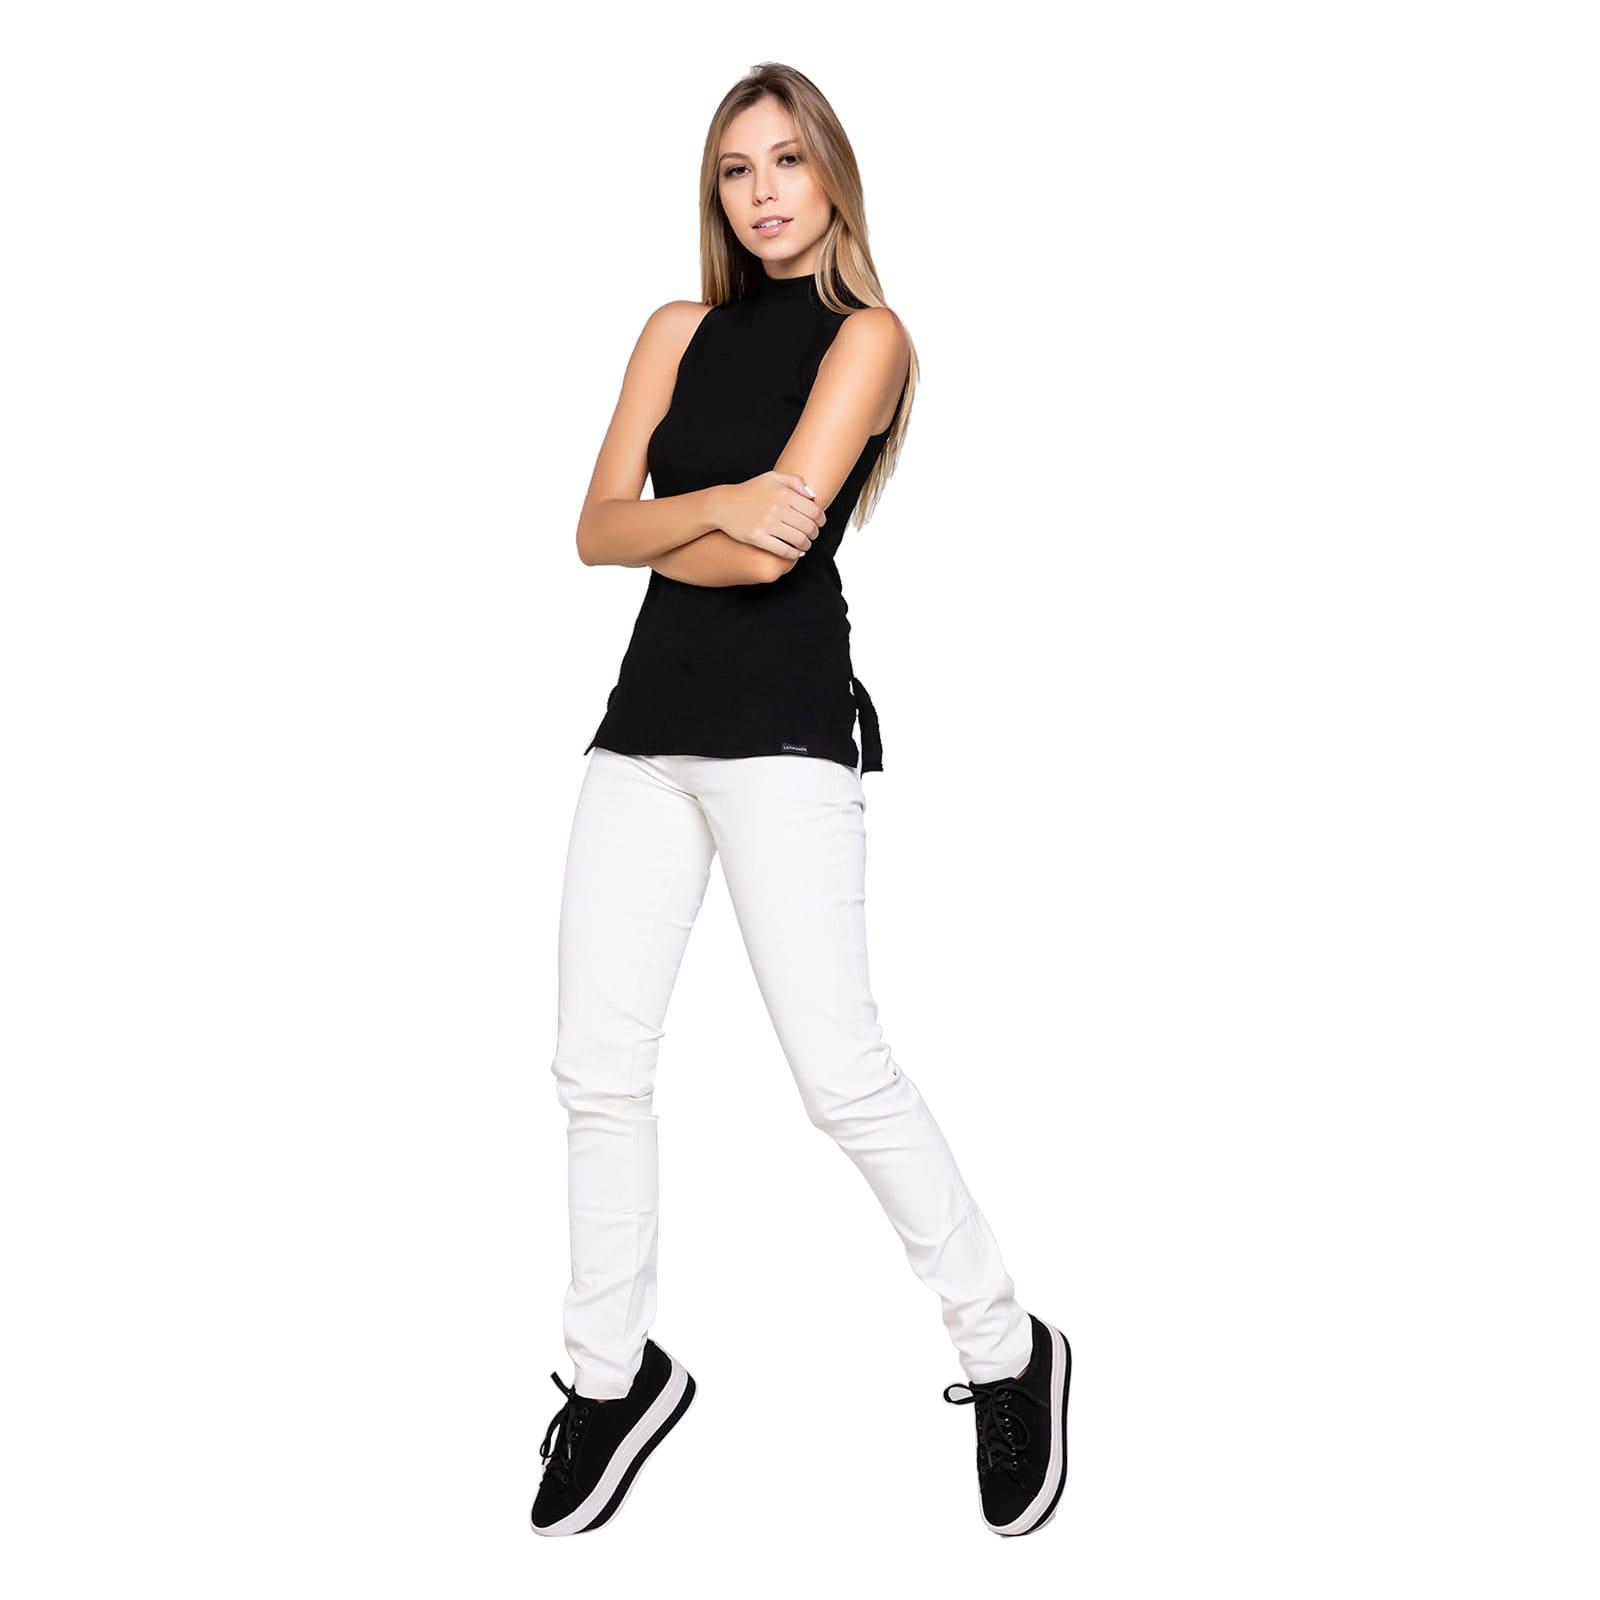 Calça Skinny Feminina Saint Tropez